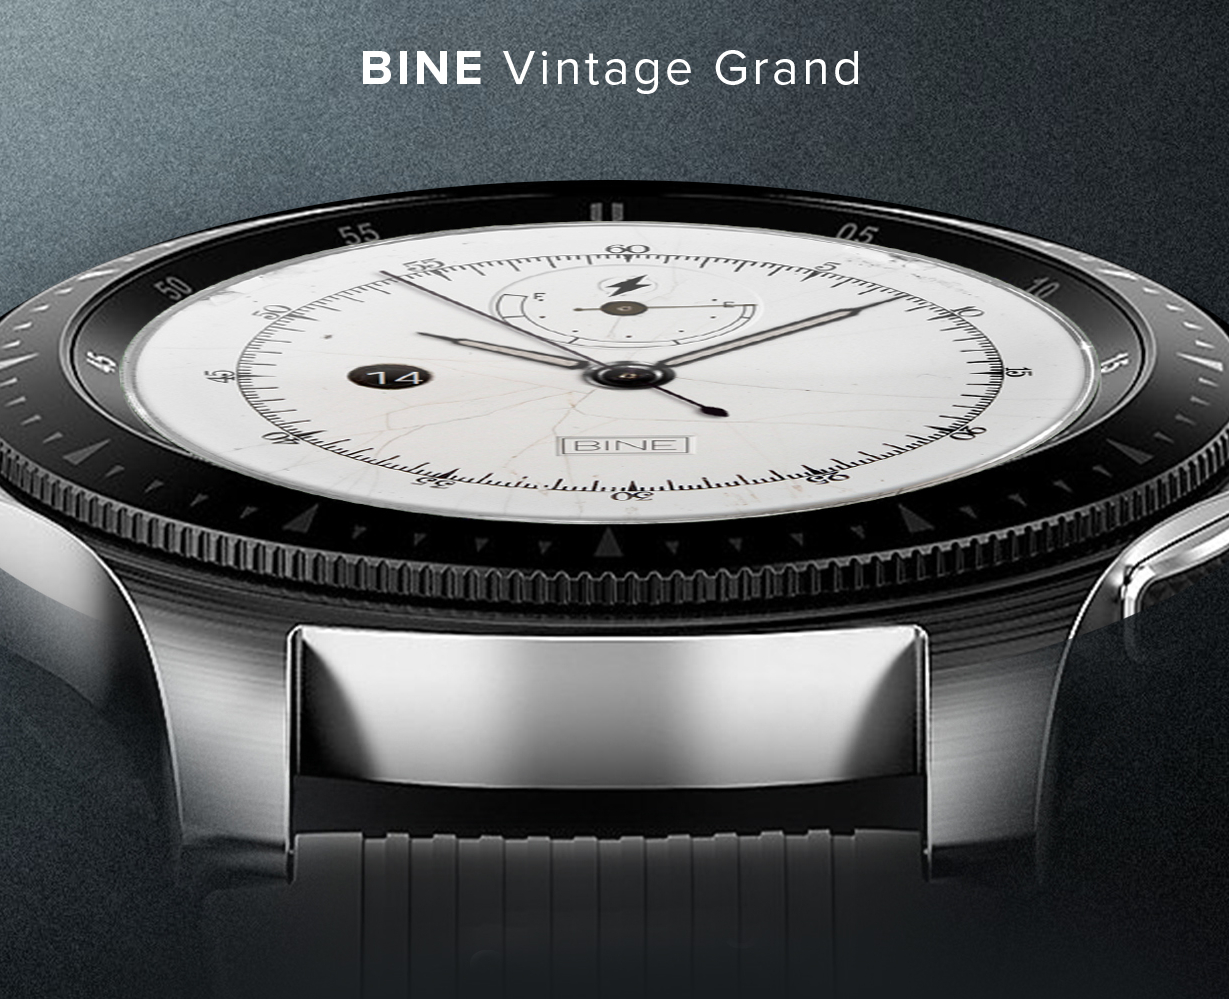 BINE Vintage Grand